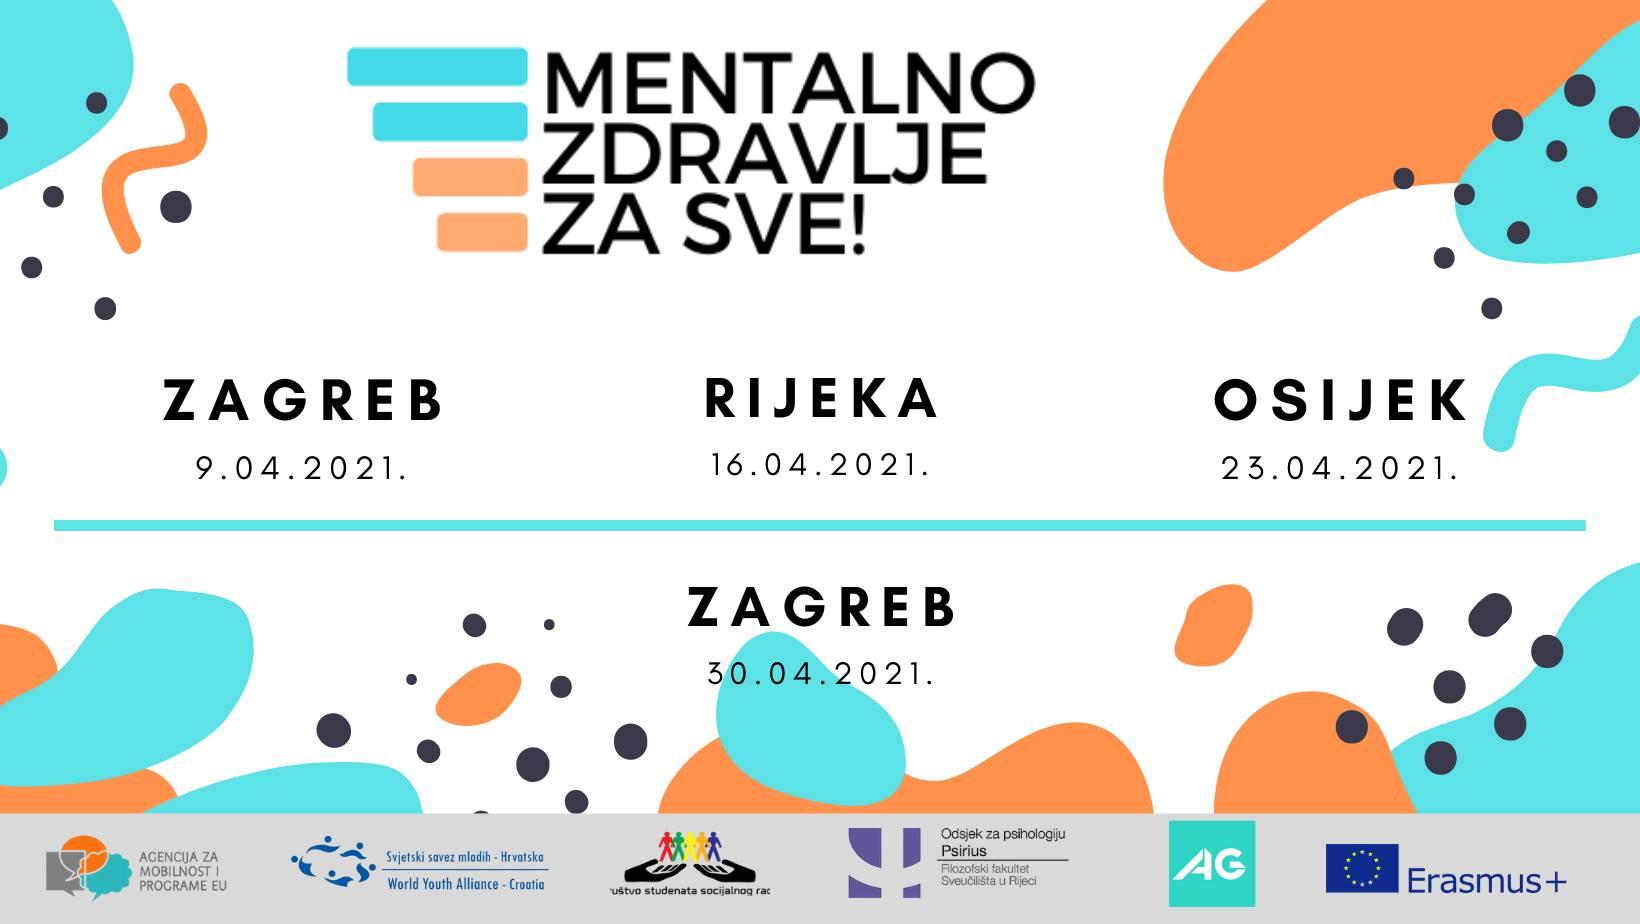 Konferencija Mentalno zdravlje za sve!